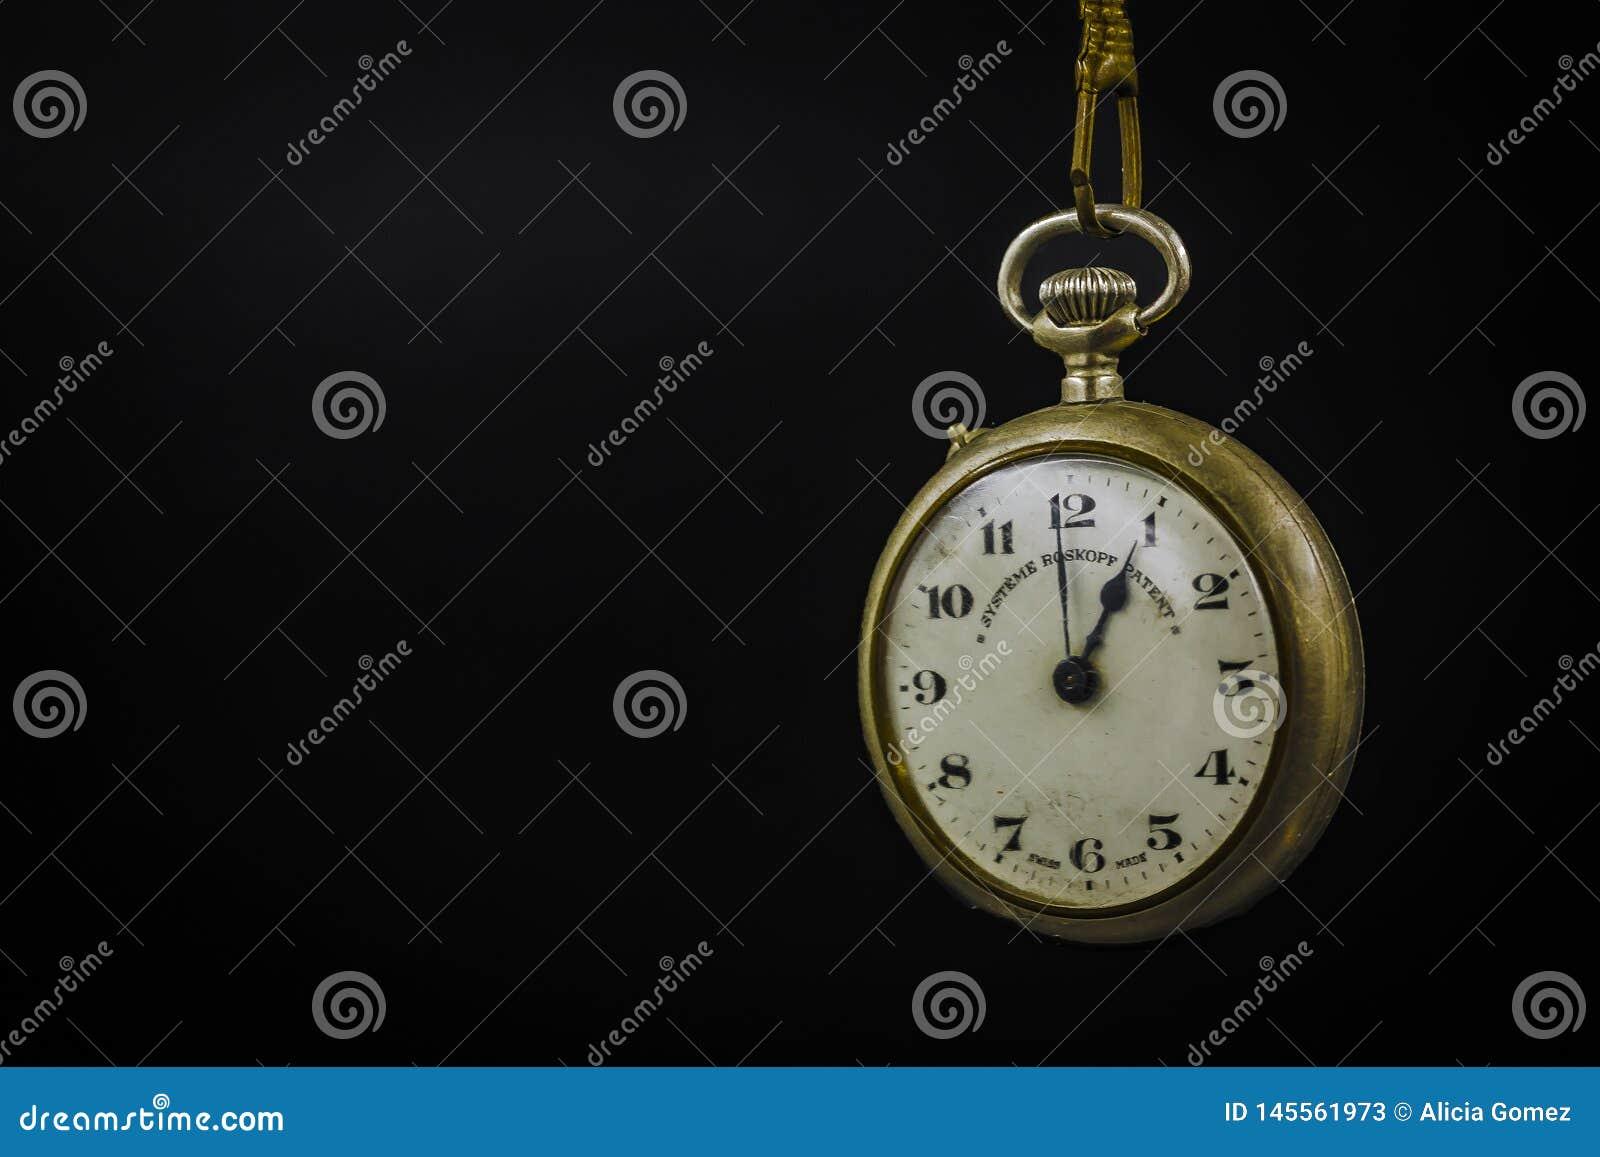 Detalle macro del reloj de bolsillo viejo del cromo del metal con la cadena